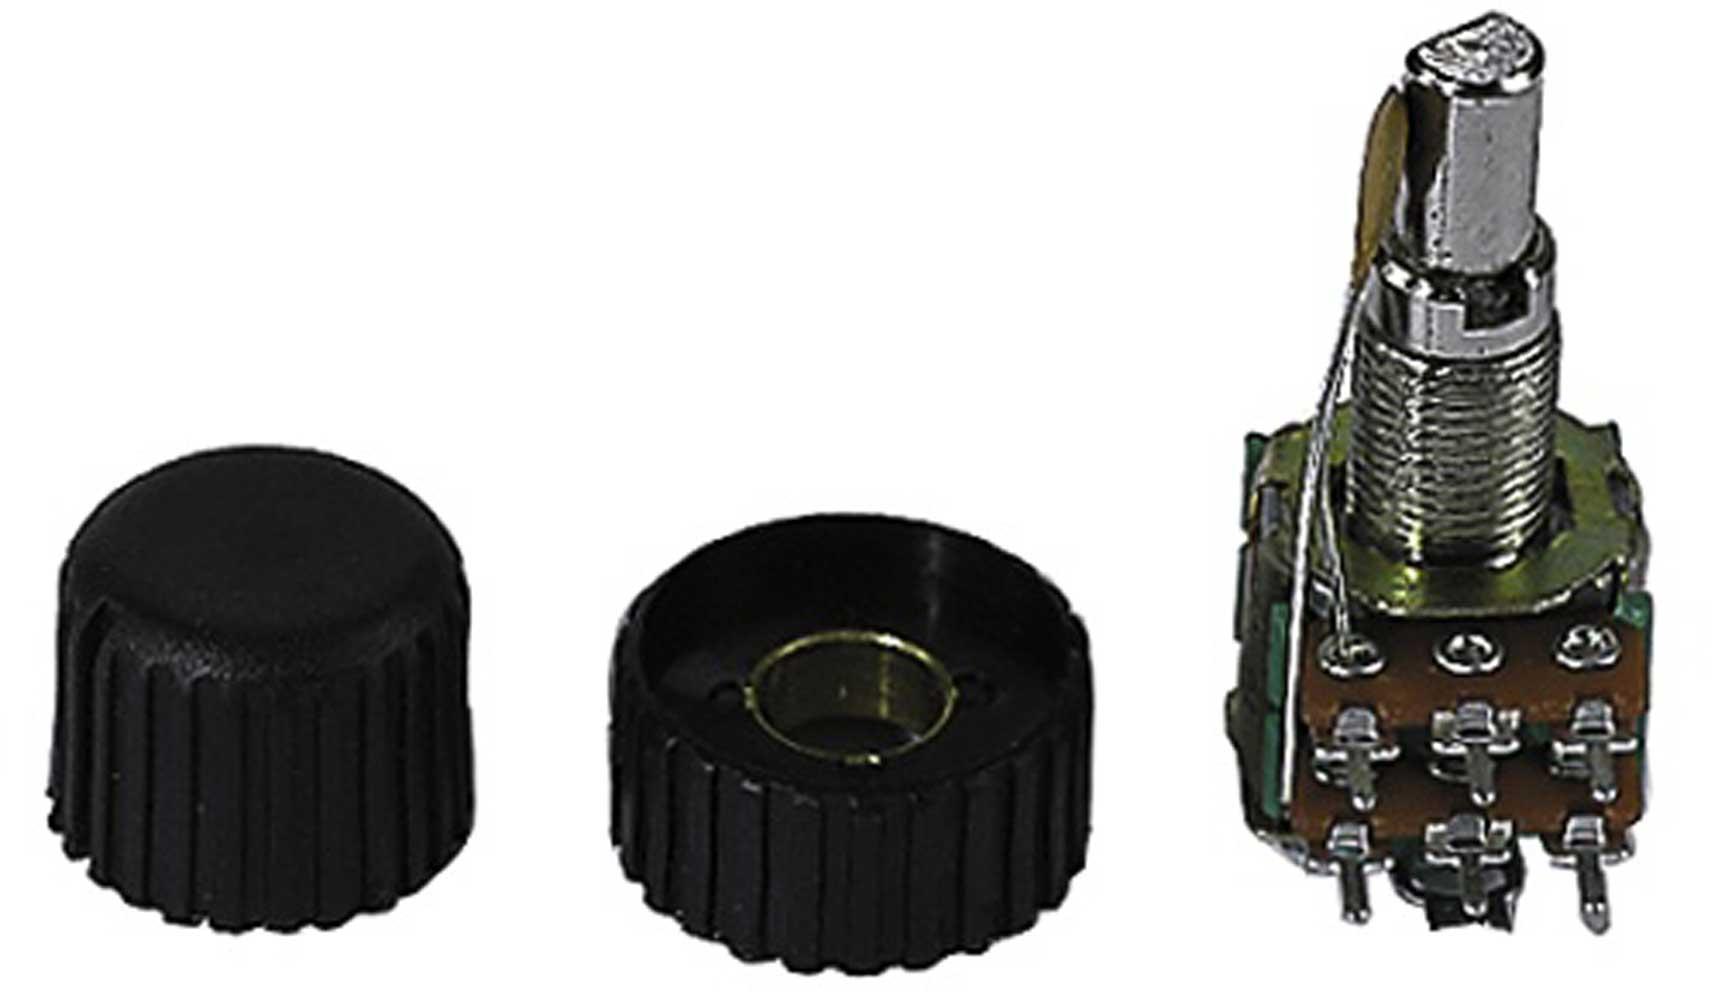 Buy EMG Potentiometer - Single Pot (with pot knob) online